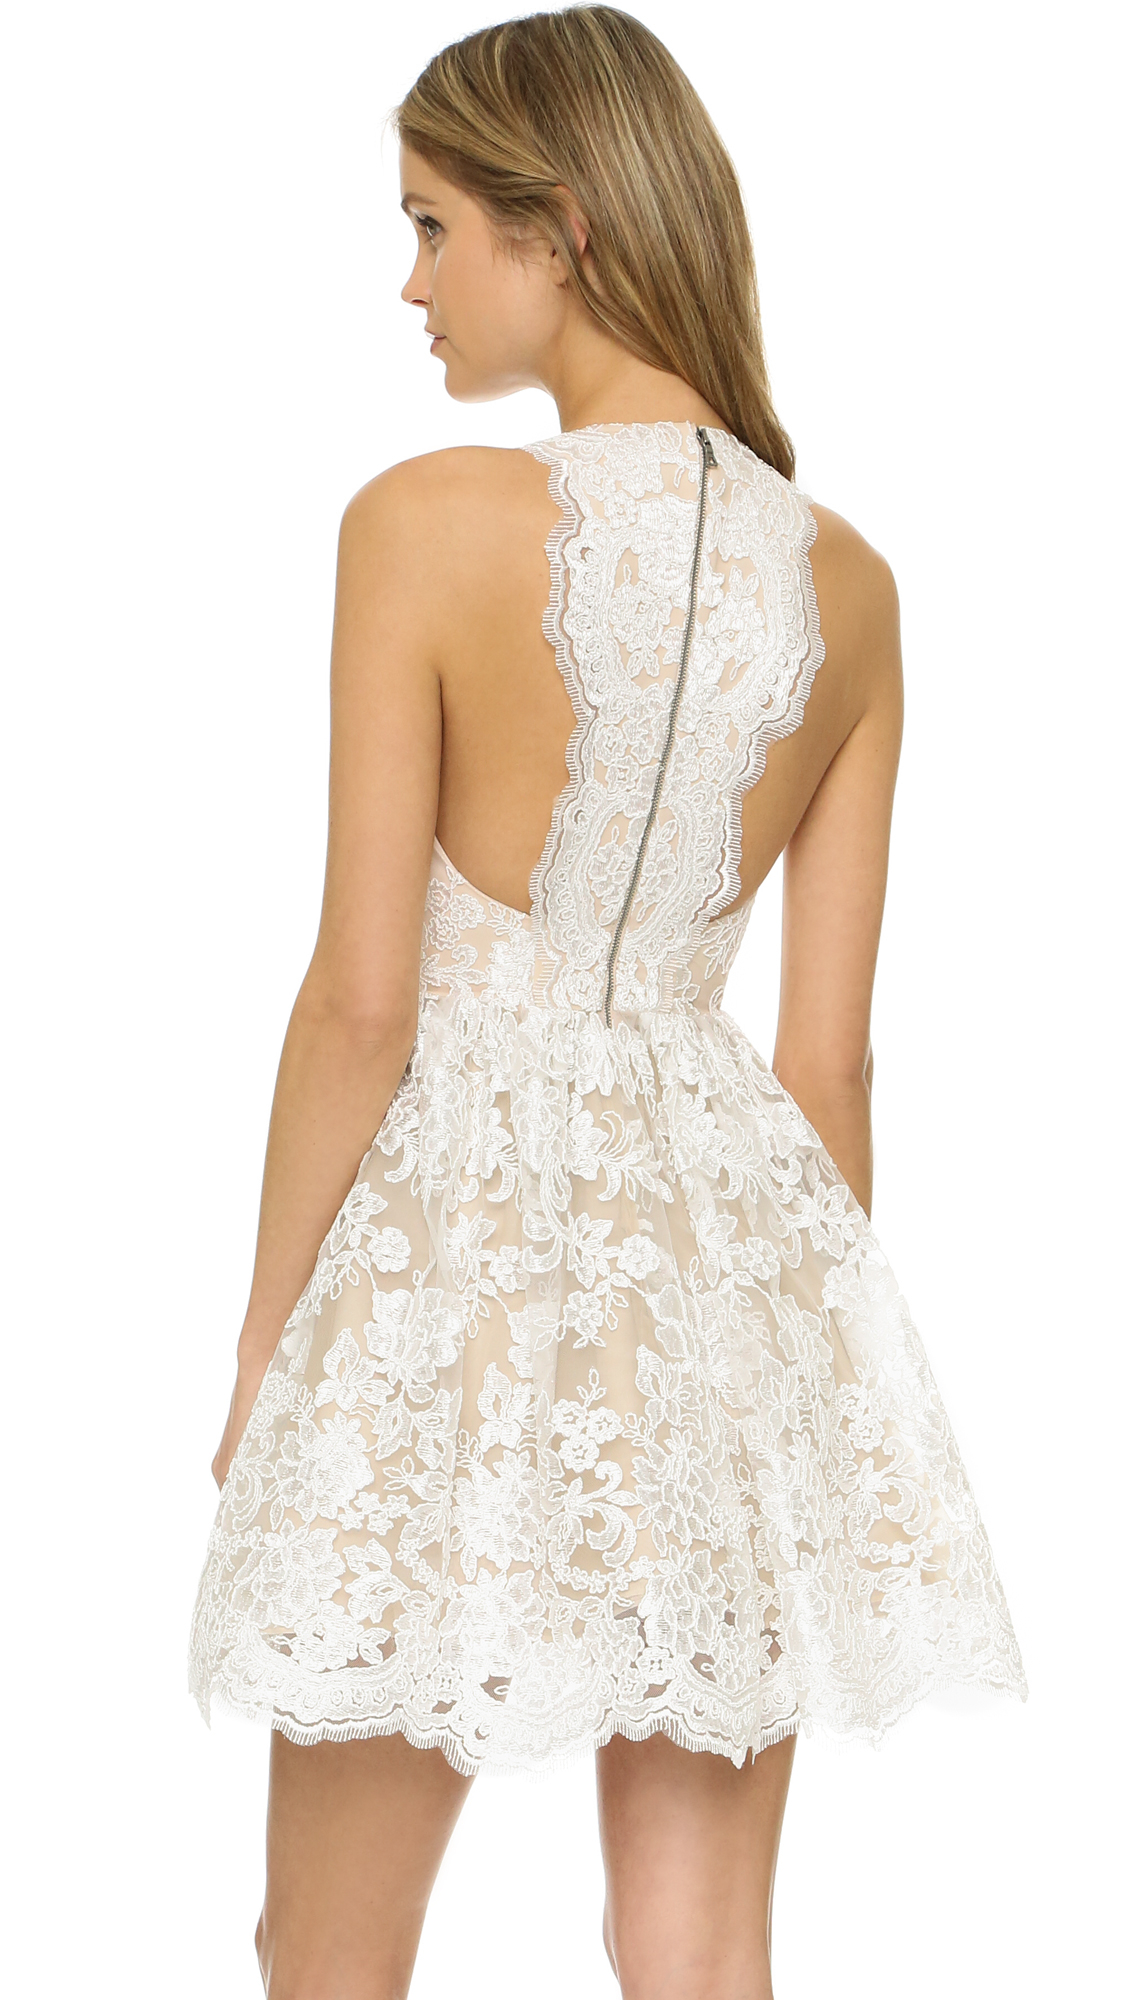 470f237f03cf Alice + Olivia Ladonna Party Dress in White - Lyst